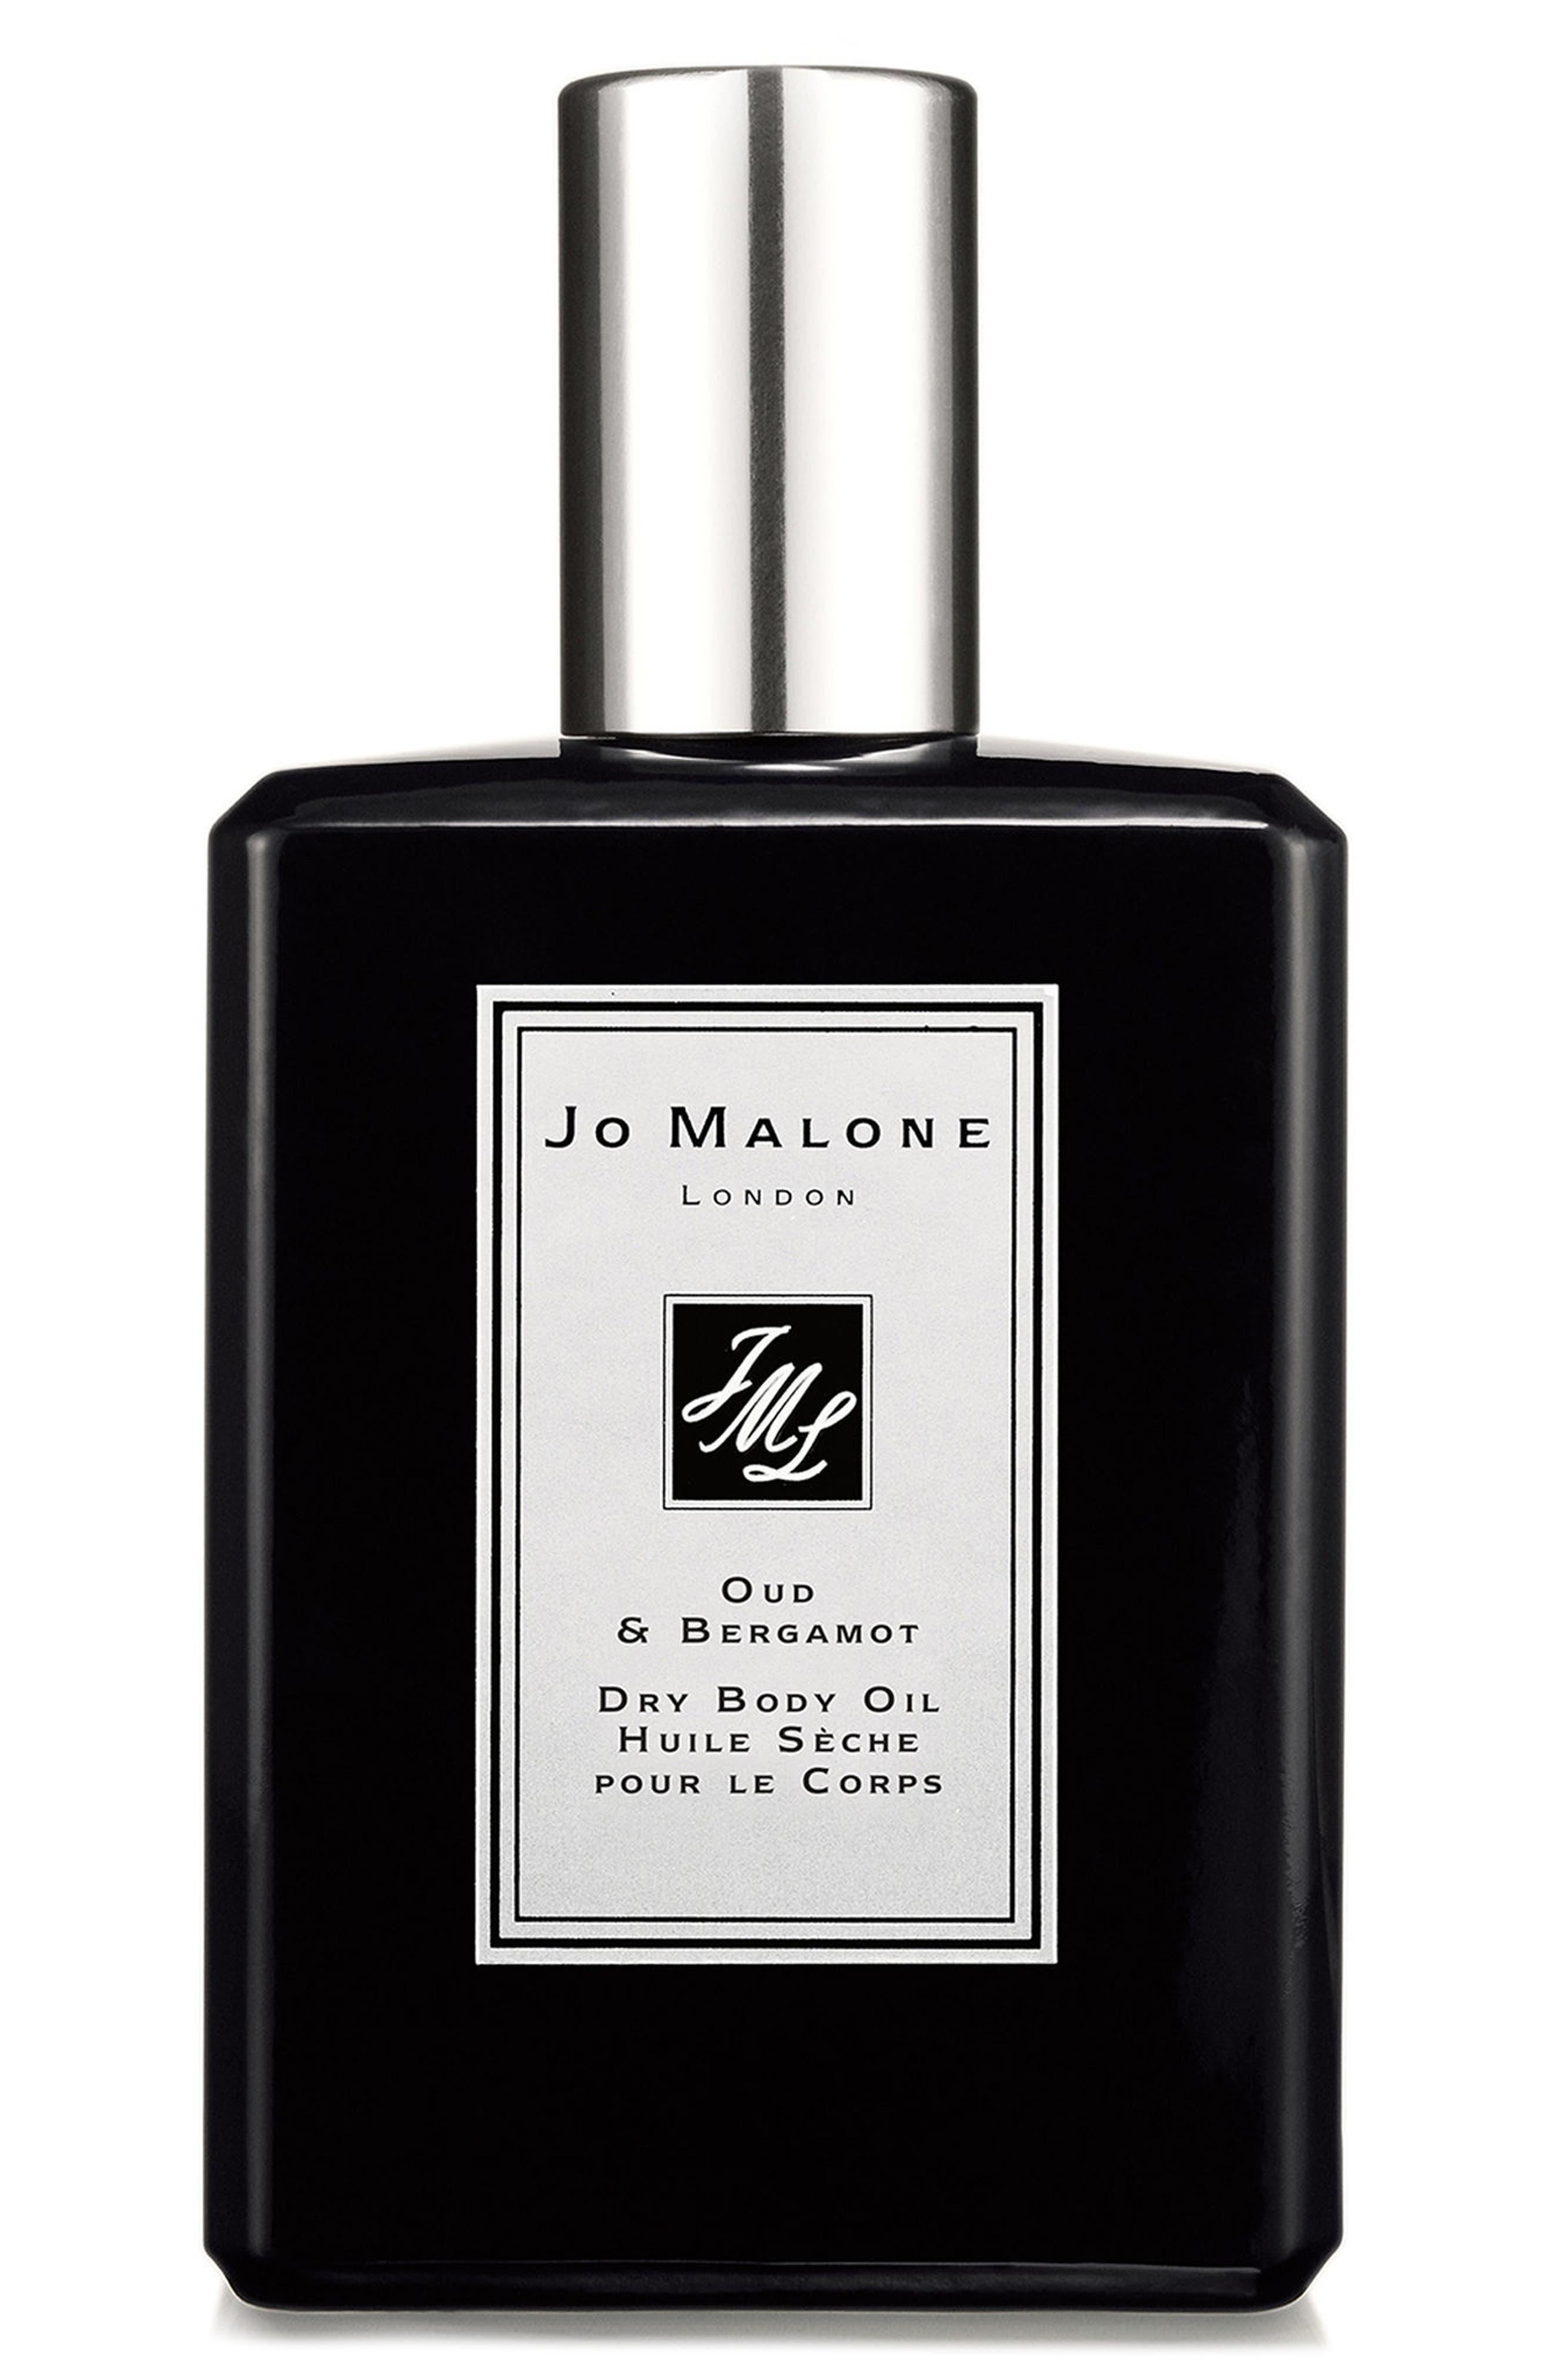 Alternate Image 1 Selected - Jo Malone London™ 'Oud & Bergamot' Dry Body Oil